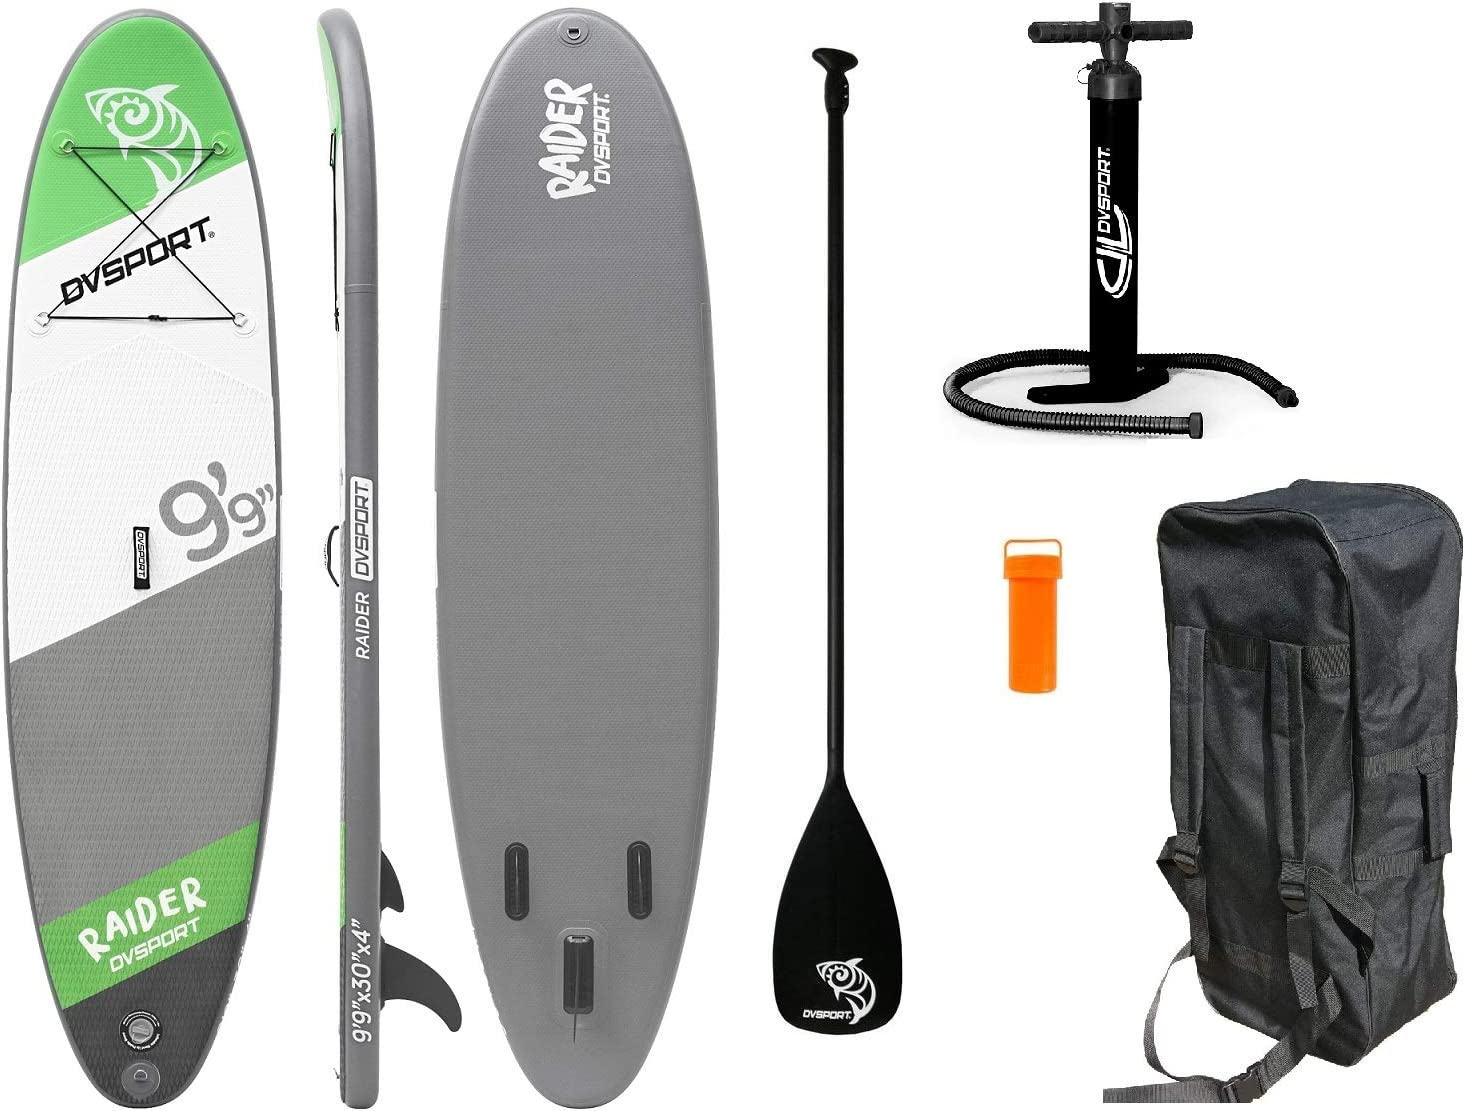 Paddle Board STAND UP SURF-BOARD TAVOLA DA SURF GONFIABILE pagaia ISUP Paddling SUP